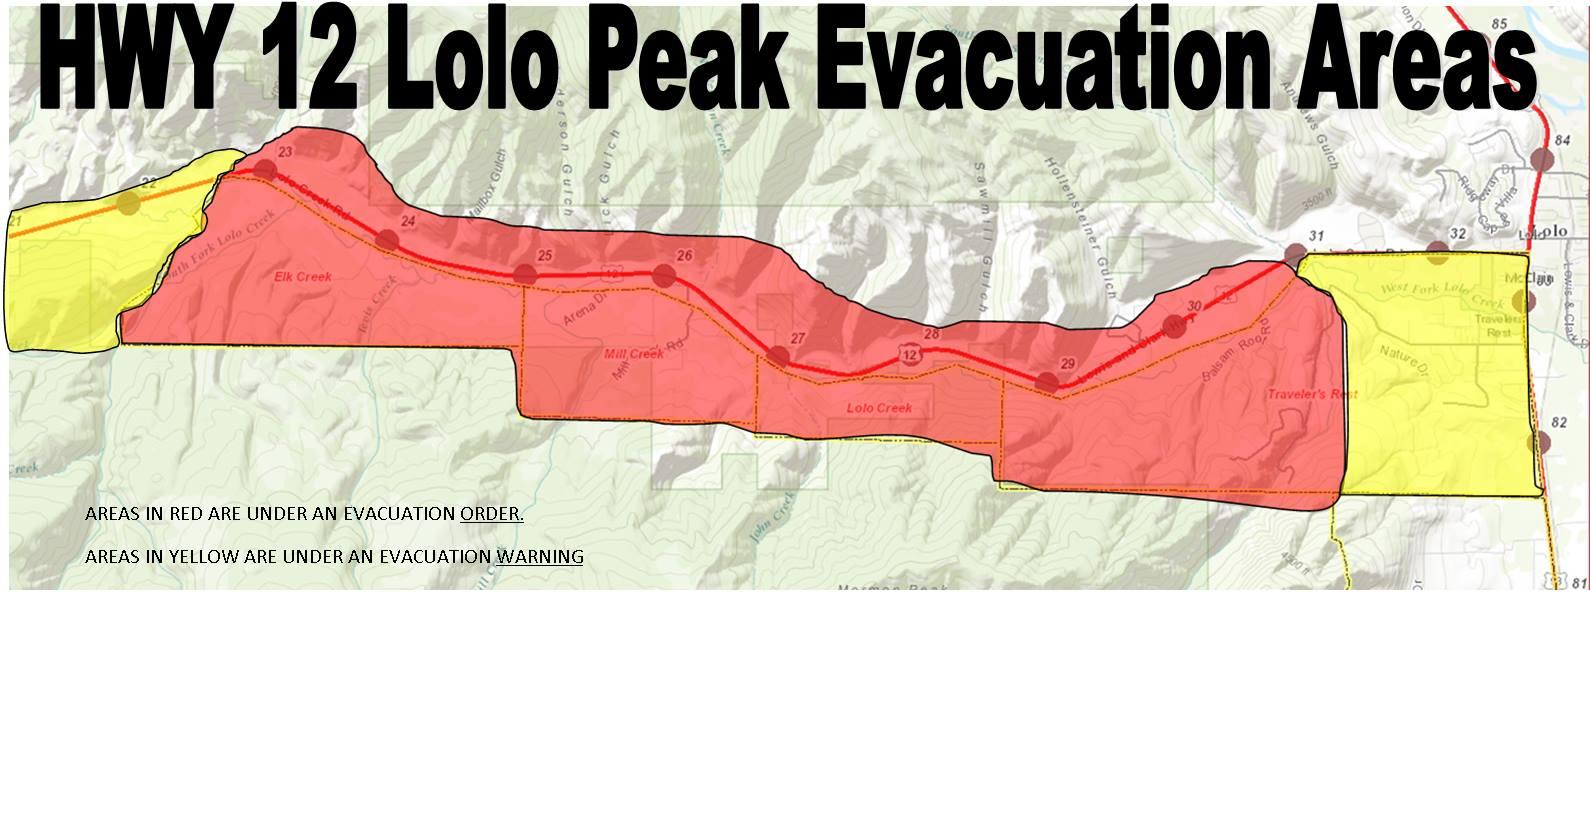 Lolo Peak fire's evacuation orders, warnings now include 1150 homes